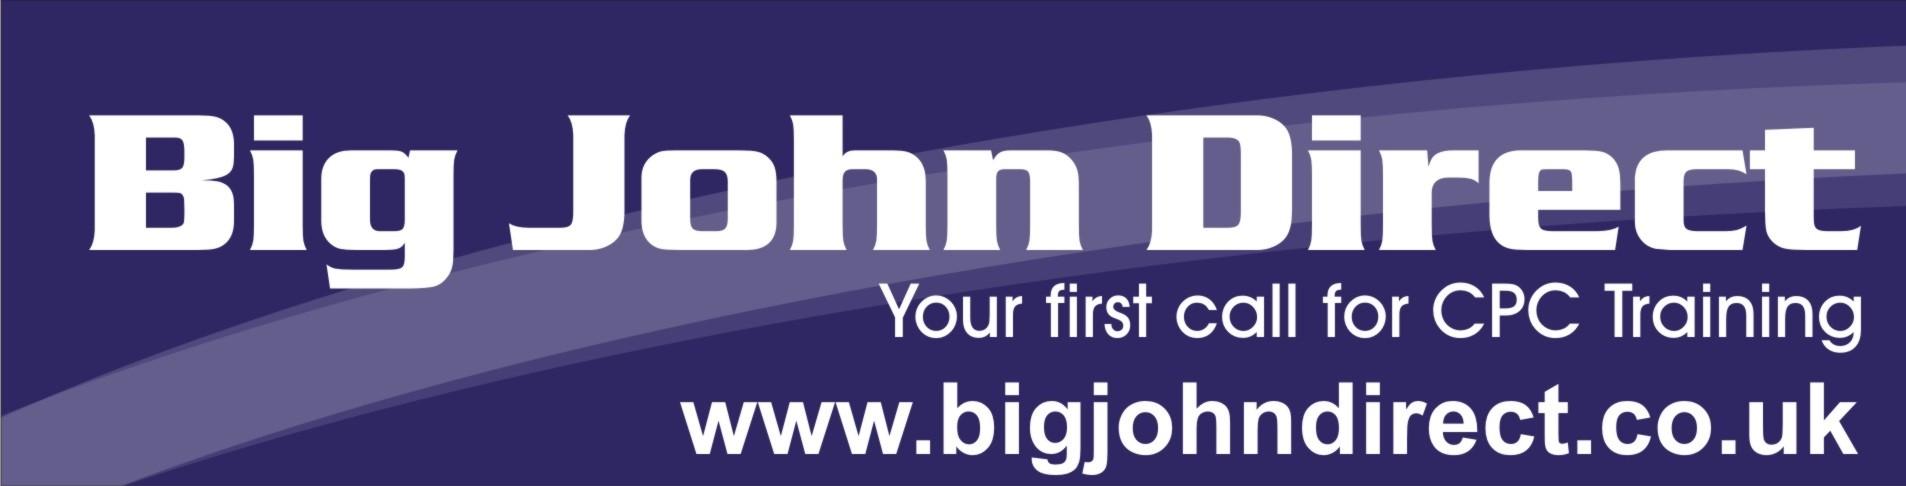 Big John Direct